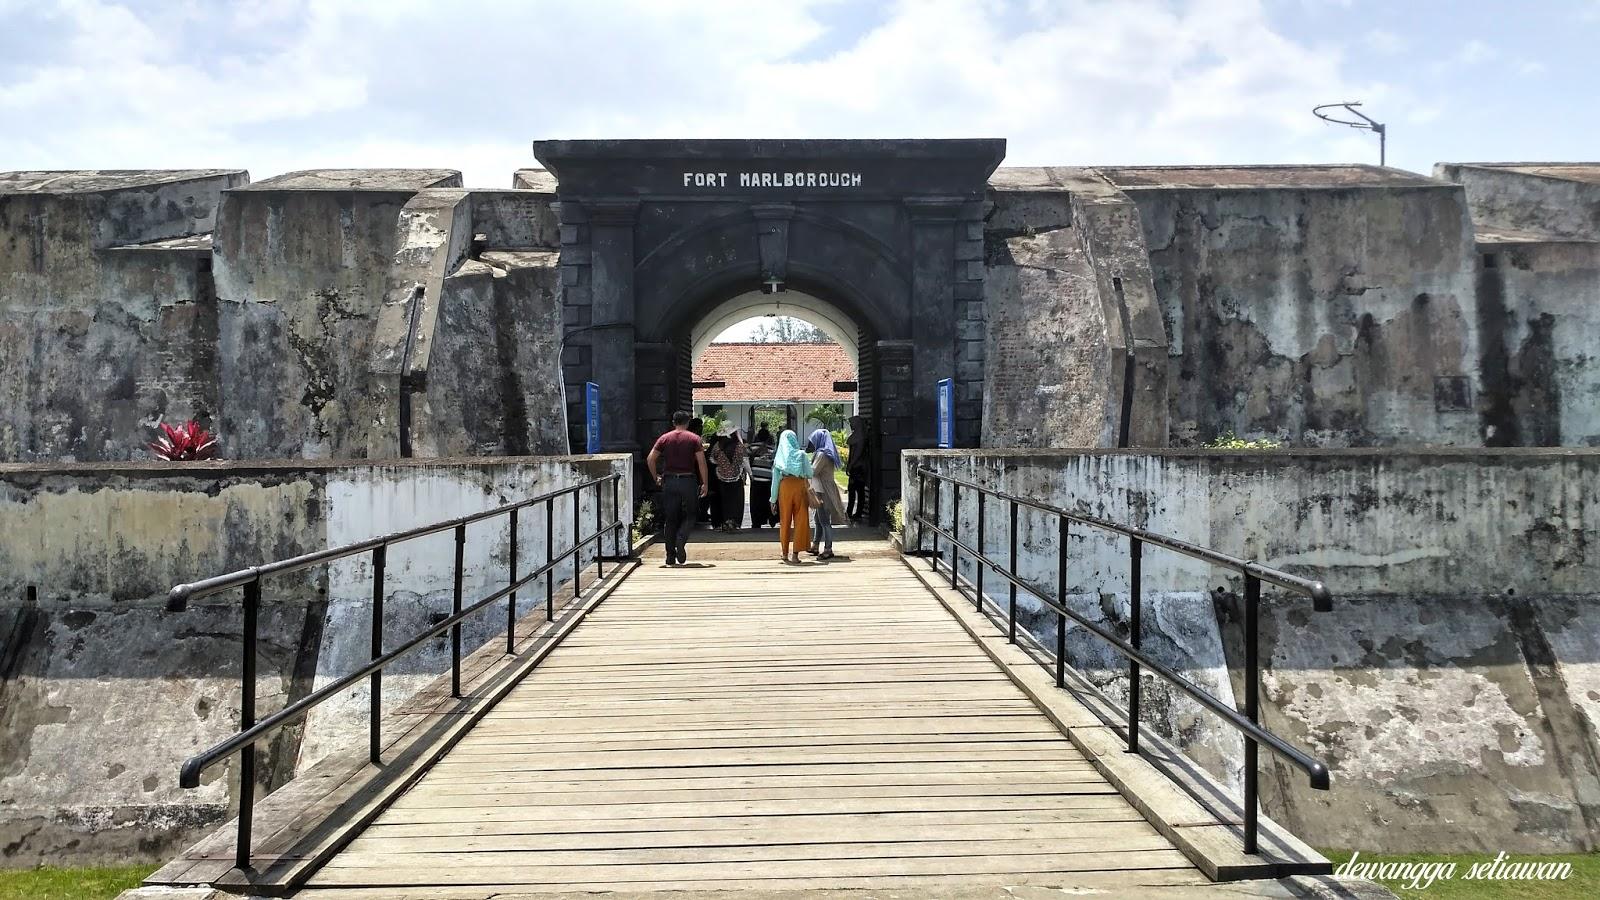 Gerbang masuk benteng fort marlborough